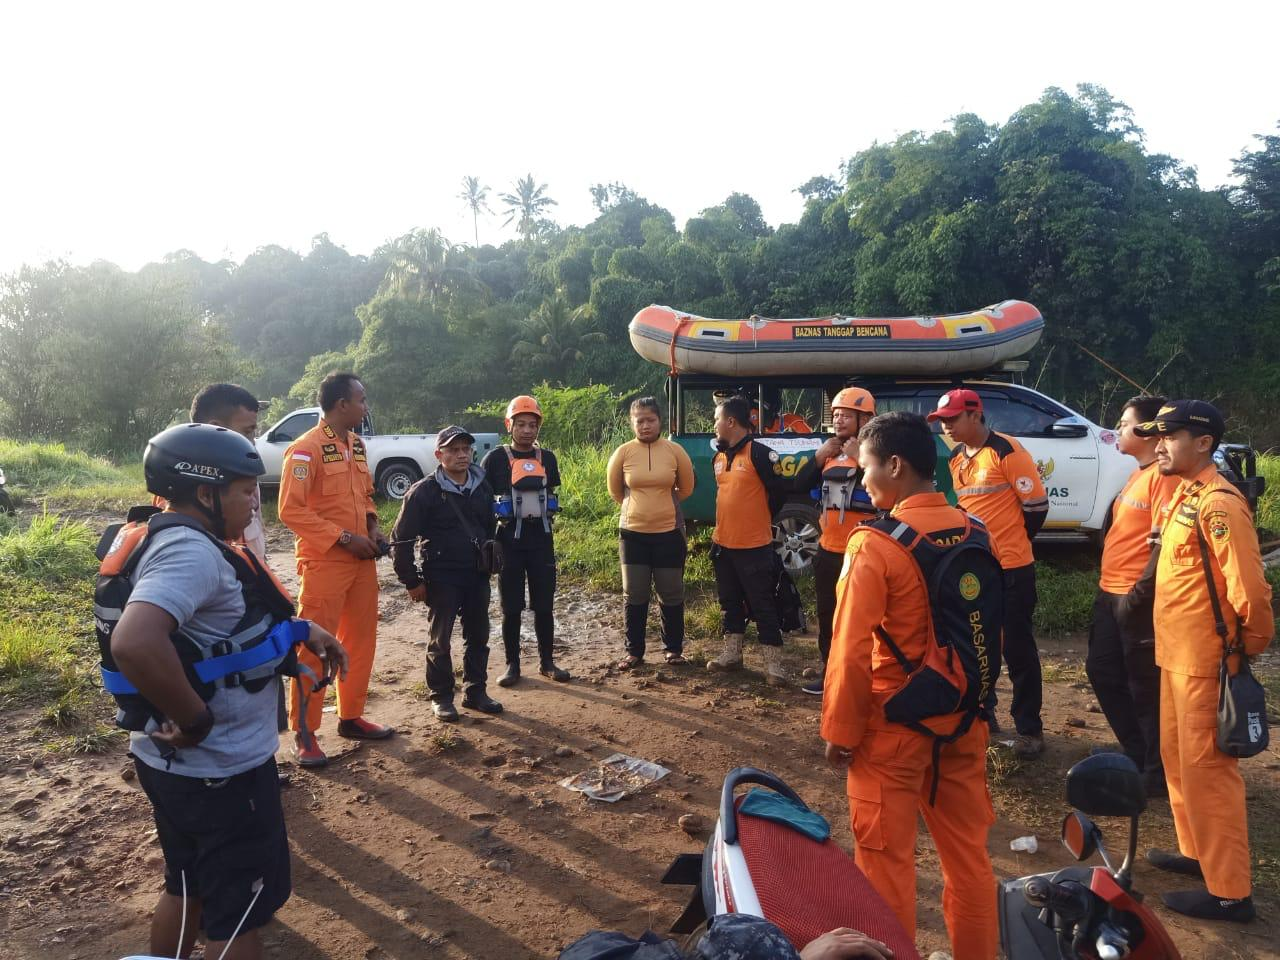 Pembina Santri Tenggelam Di Sungai Ciateun Bogor 100 Tim Sar Gabungan Lakukan Pencarian Sidik Post